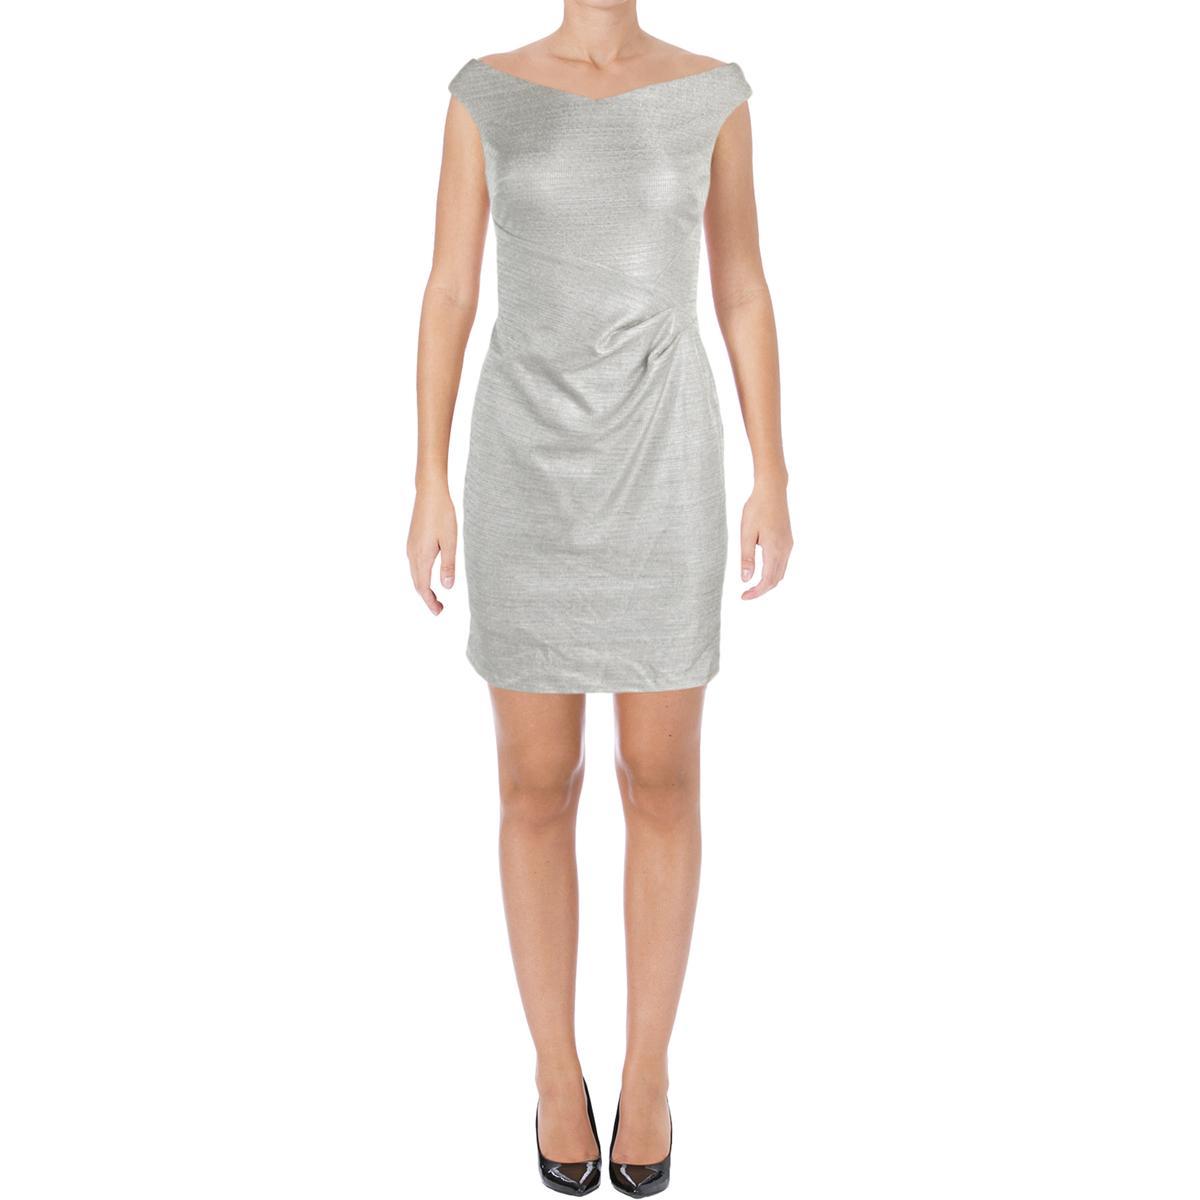 Lauren Ralph Lauren 3290 Womens Metallic Sleeveless Sheath Cocktail ...